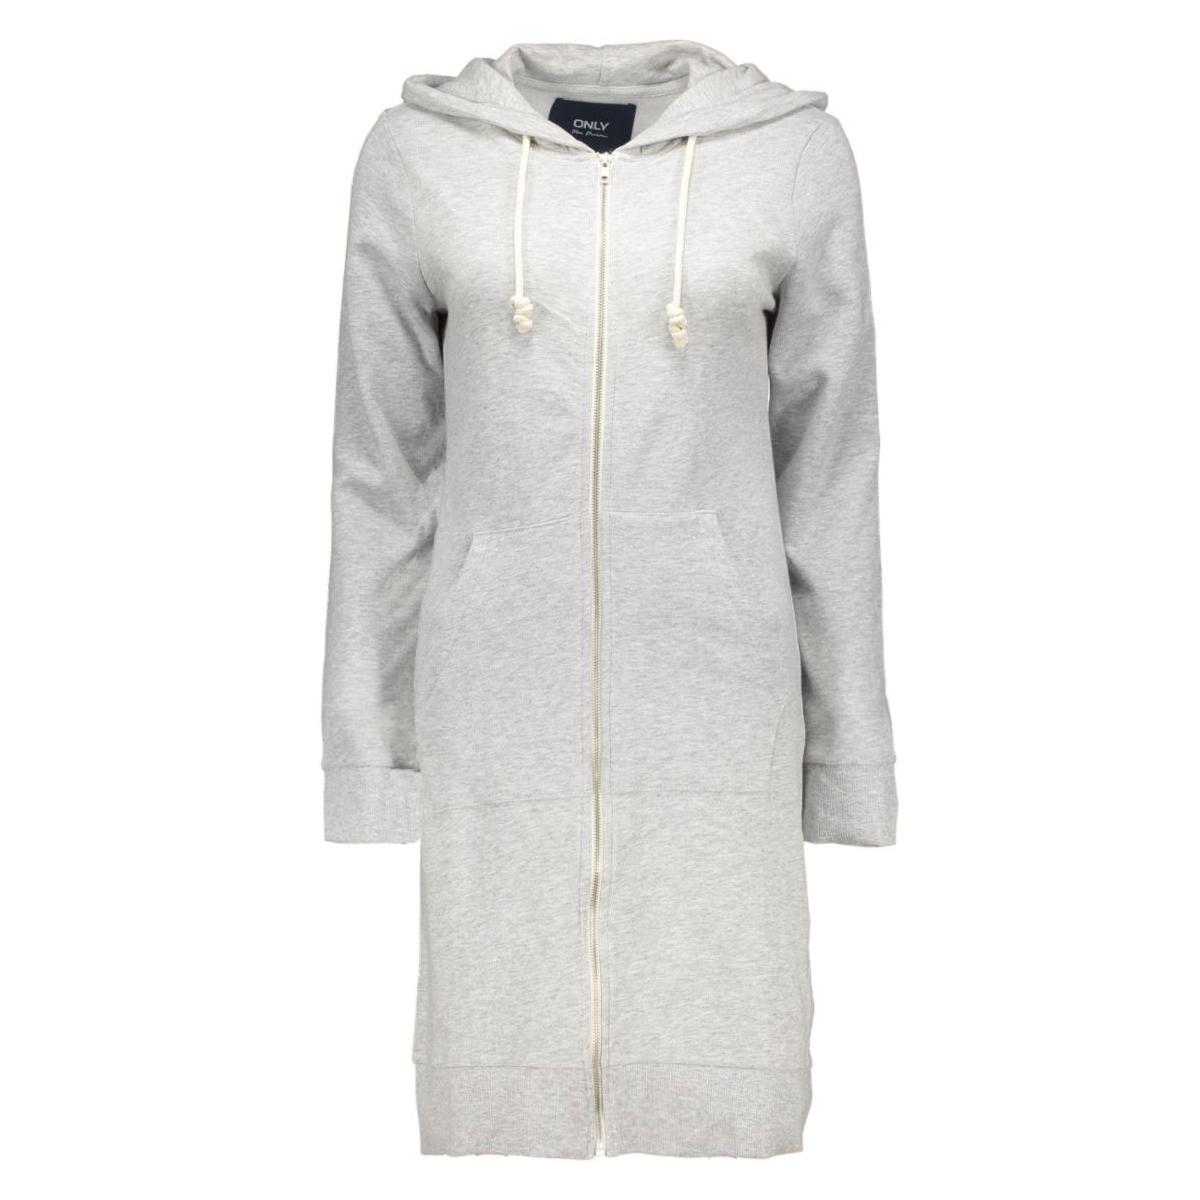 onljane l/s x-long zip hood swt 15123808 only sweater light grey melange